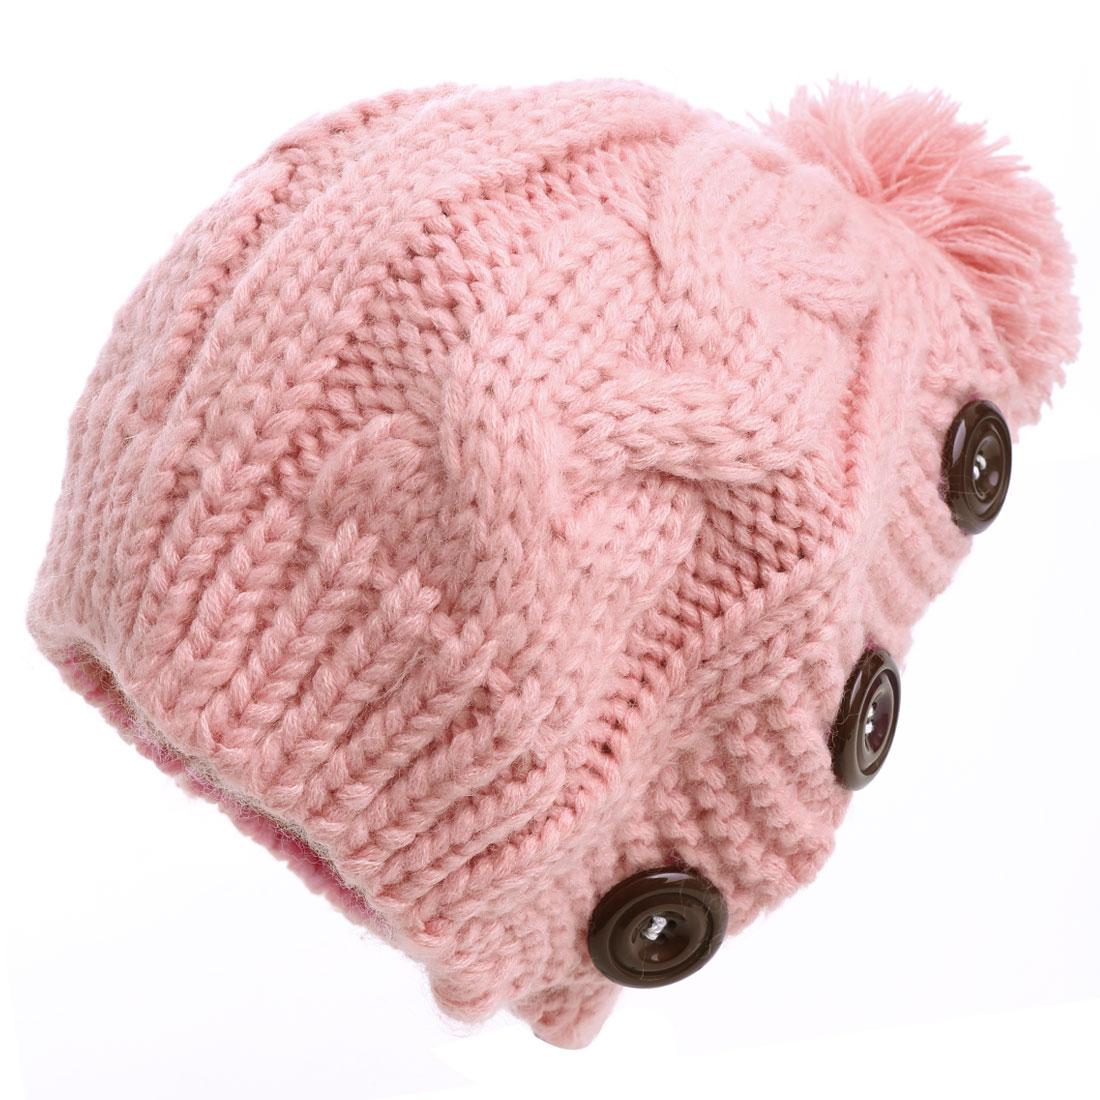 Lady Pom-pom Braided Detail Stretchy Pink Knitted Beanie Hat